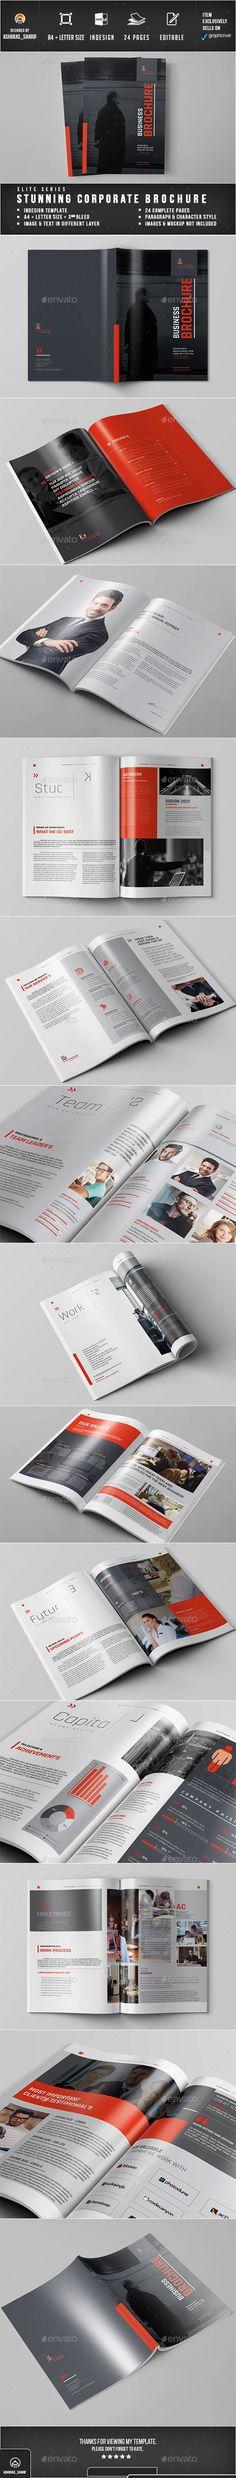 Brochure Template InDesign INDD. Download here: https://graphicriver.net/item/brochure/17561680?ref=ksioks